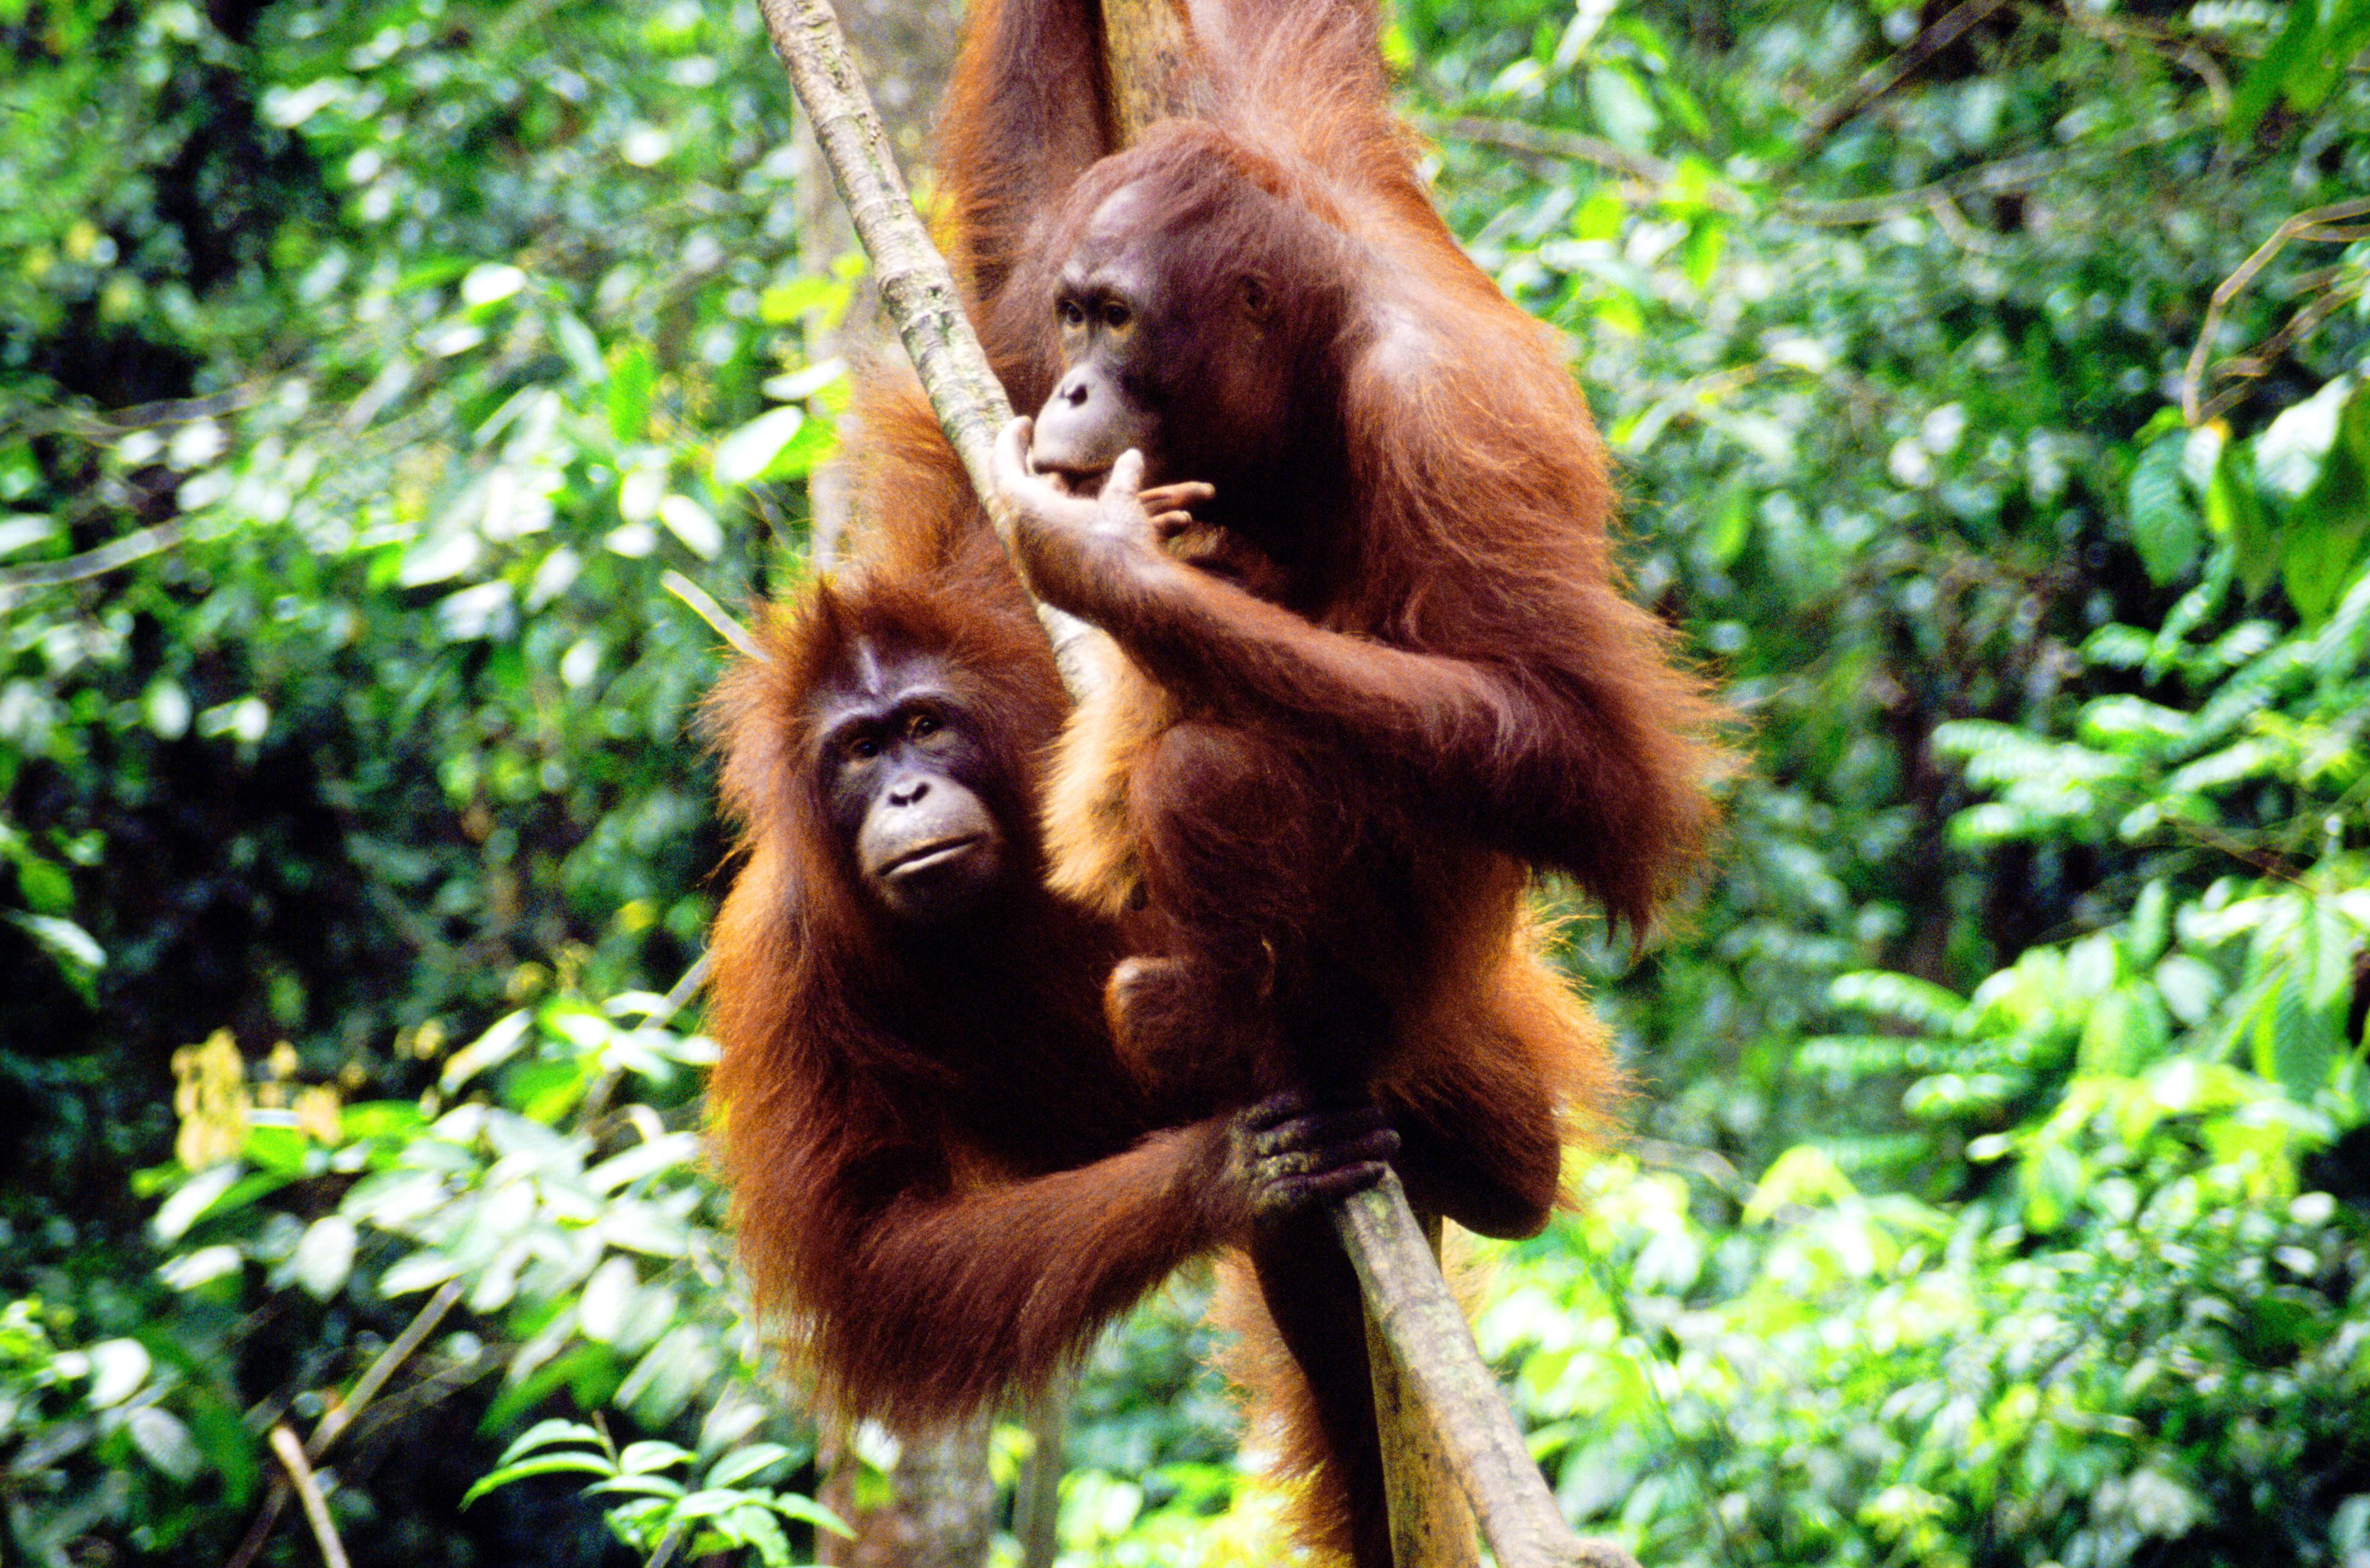 Kletternde Orang Utans - Mulu National Park - Borneo Malaysia